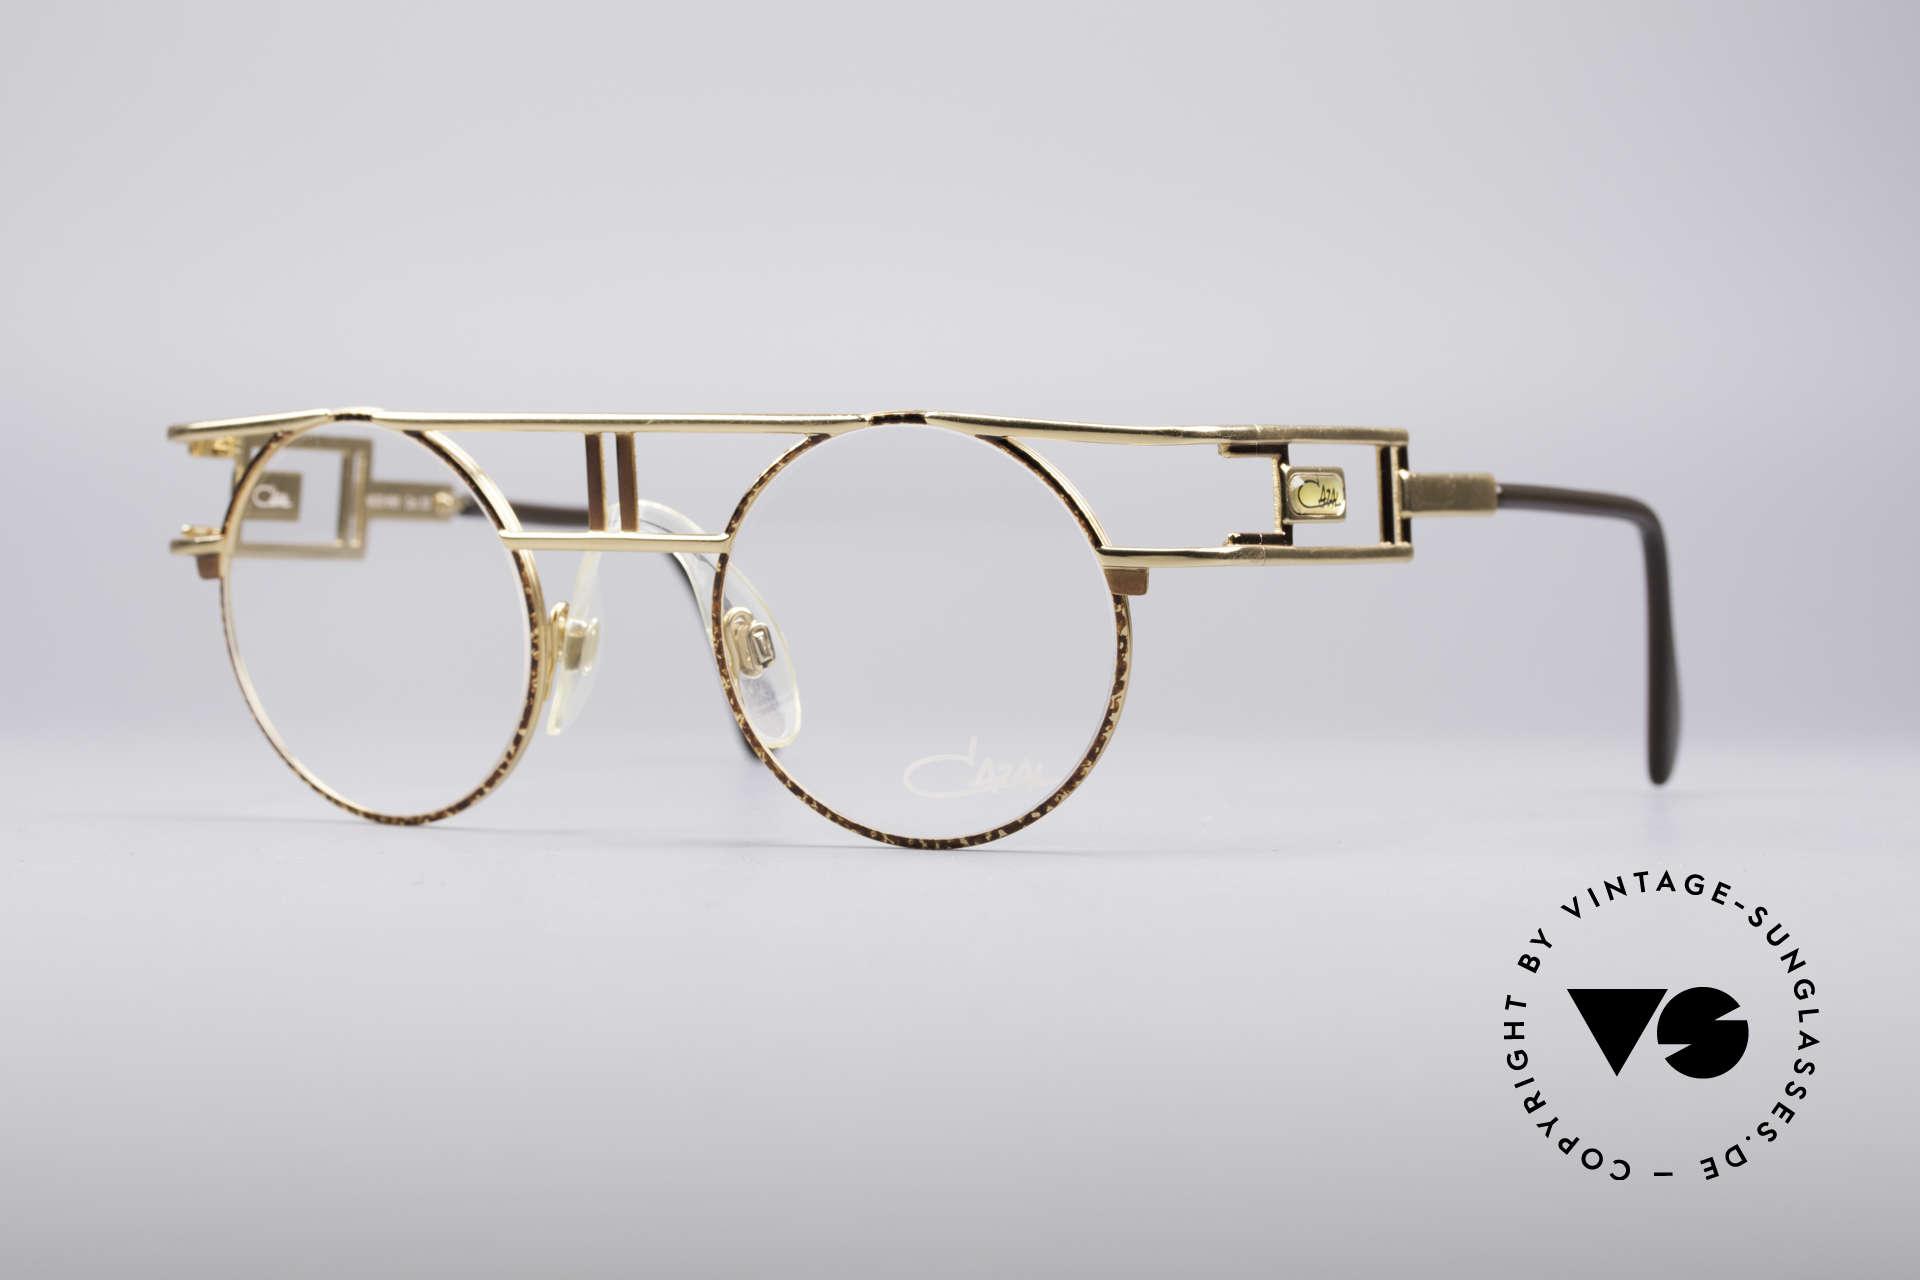 7958fa638c Brillen Cazal 958 90er Promi Vintage Brille